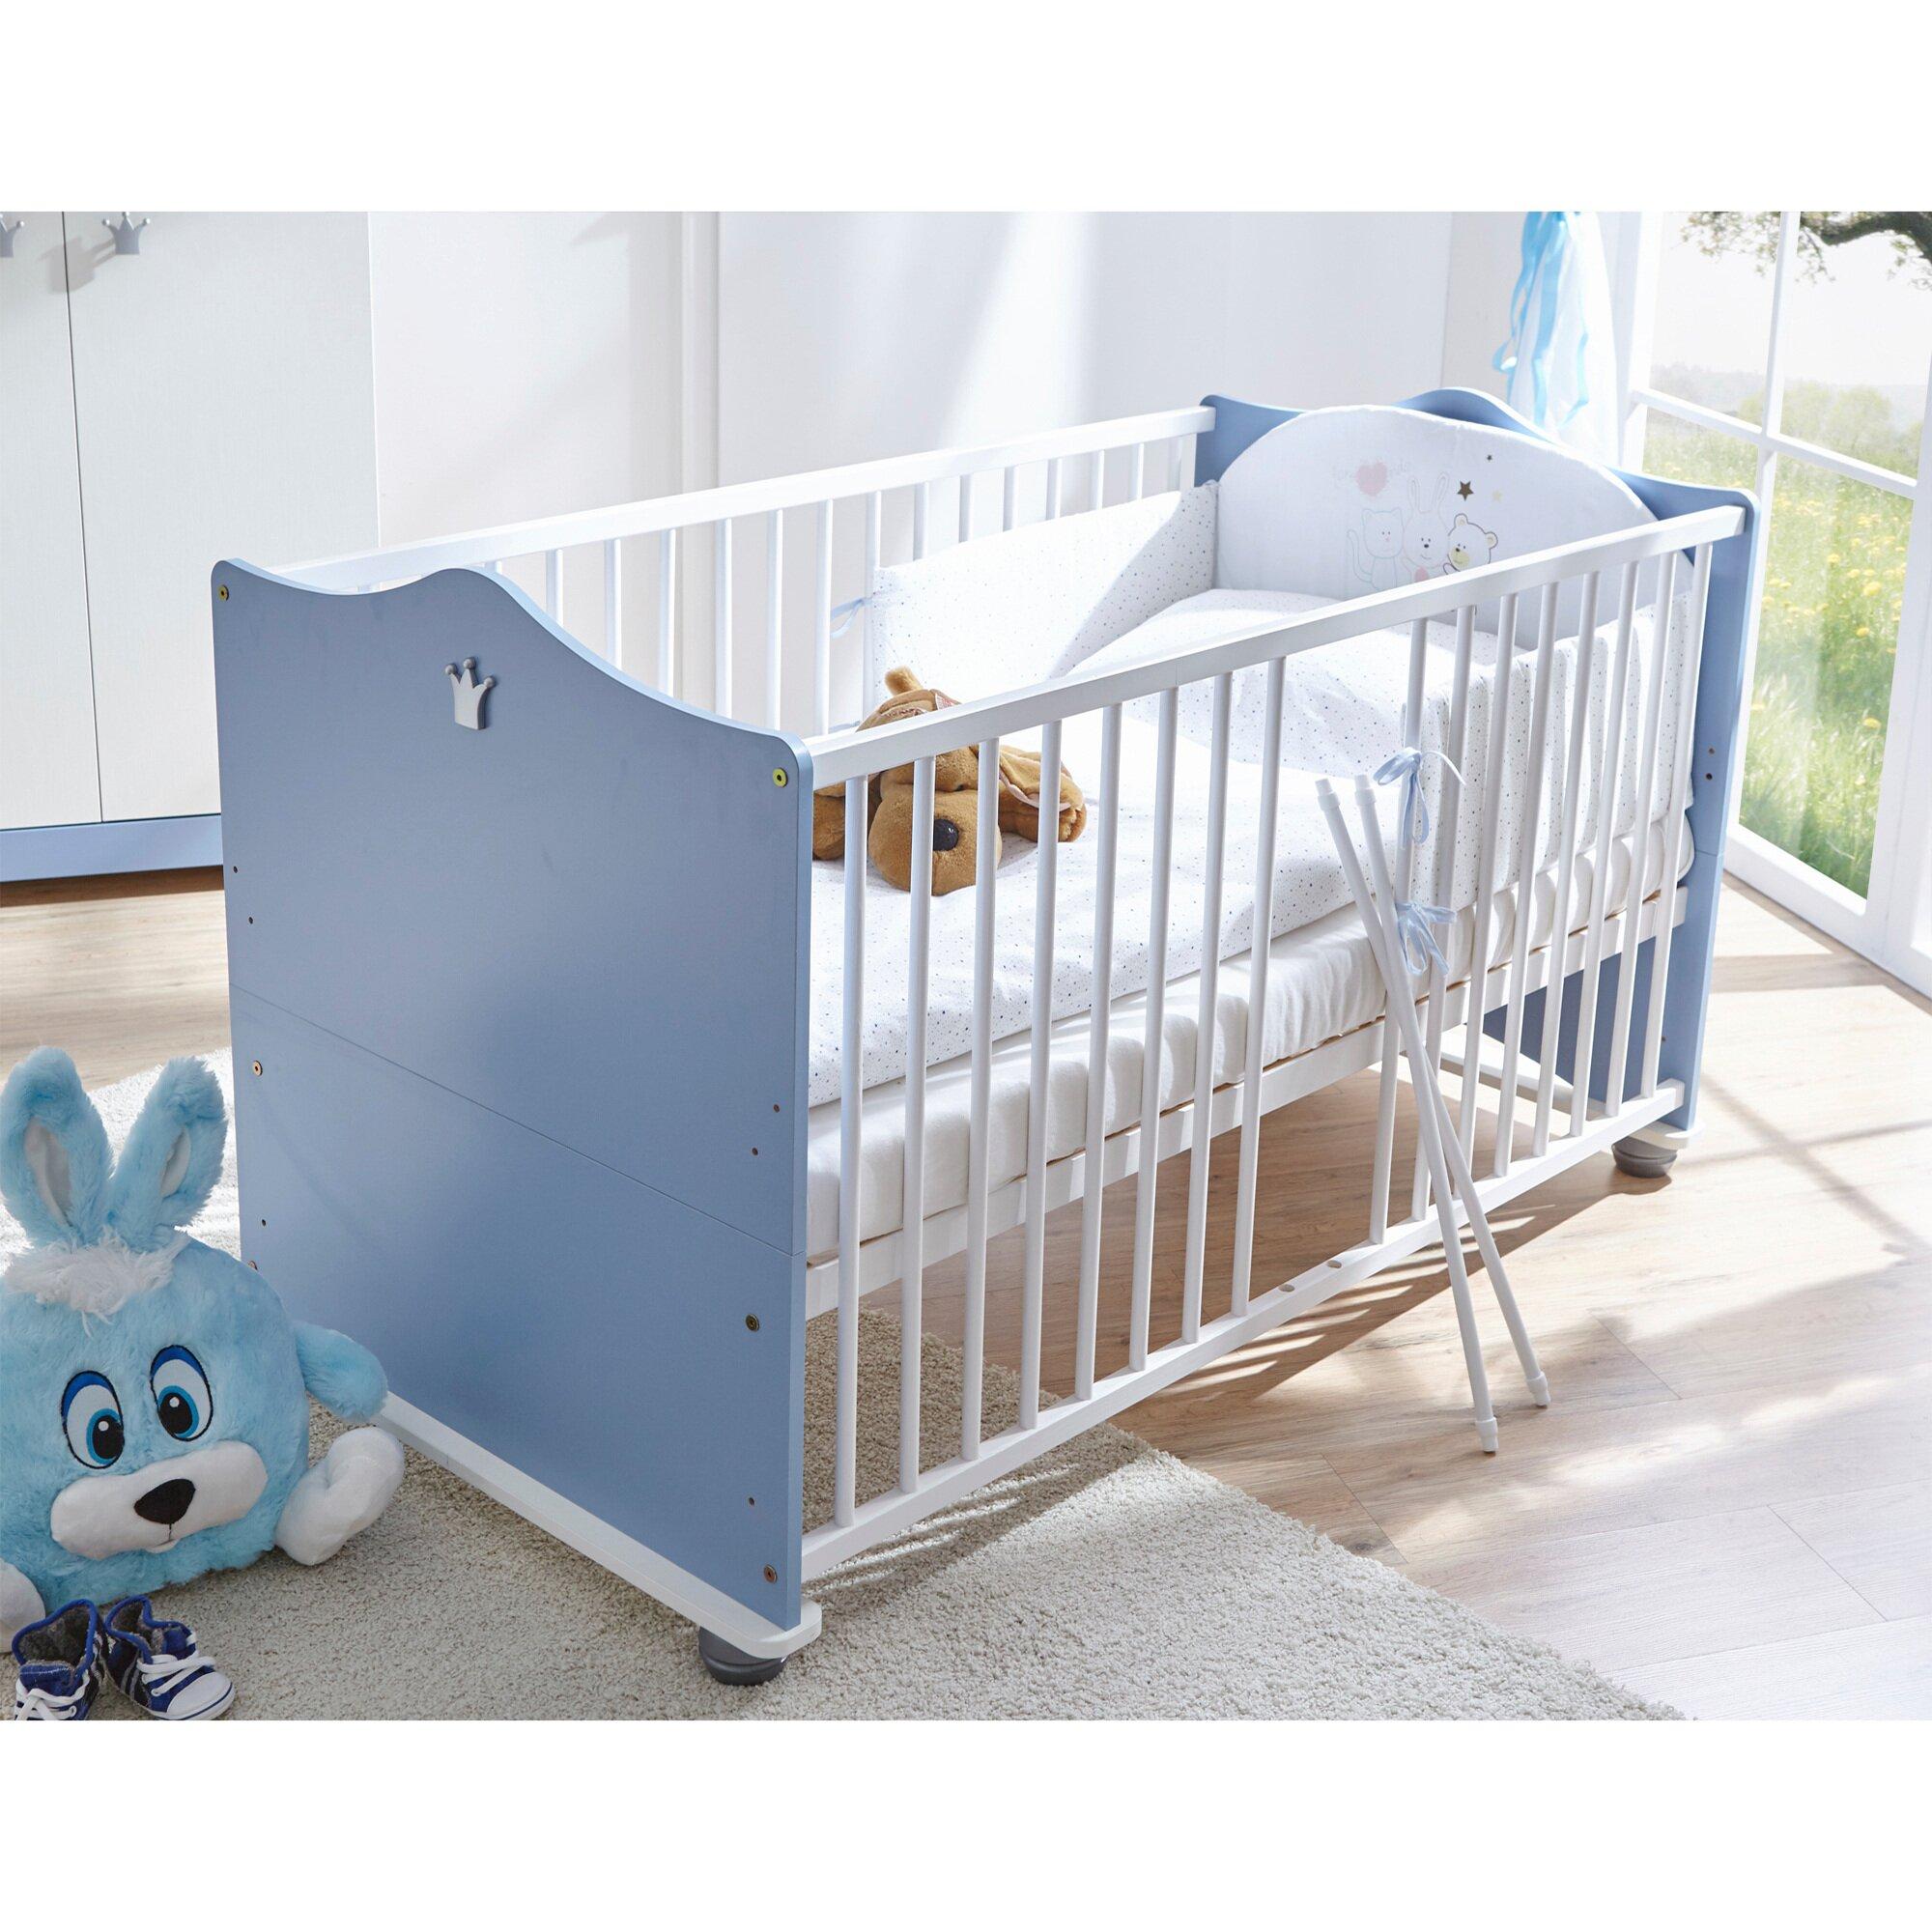 ticaa-babyzimmer-prinz-3-teilig, 382.99 EUR @ babywalz-de